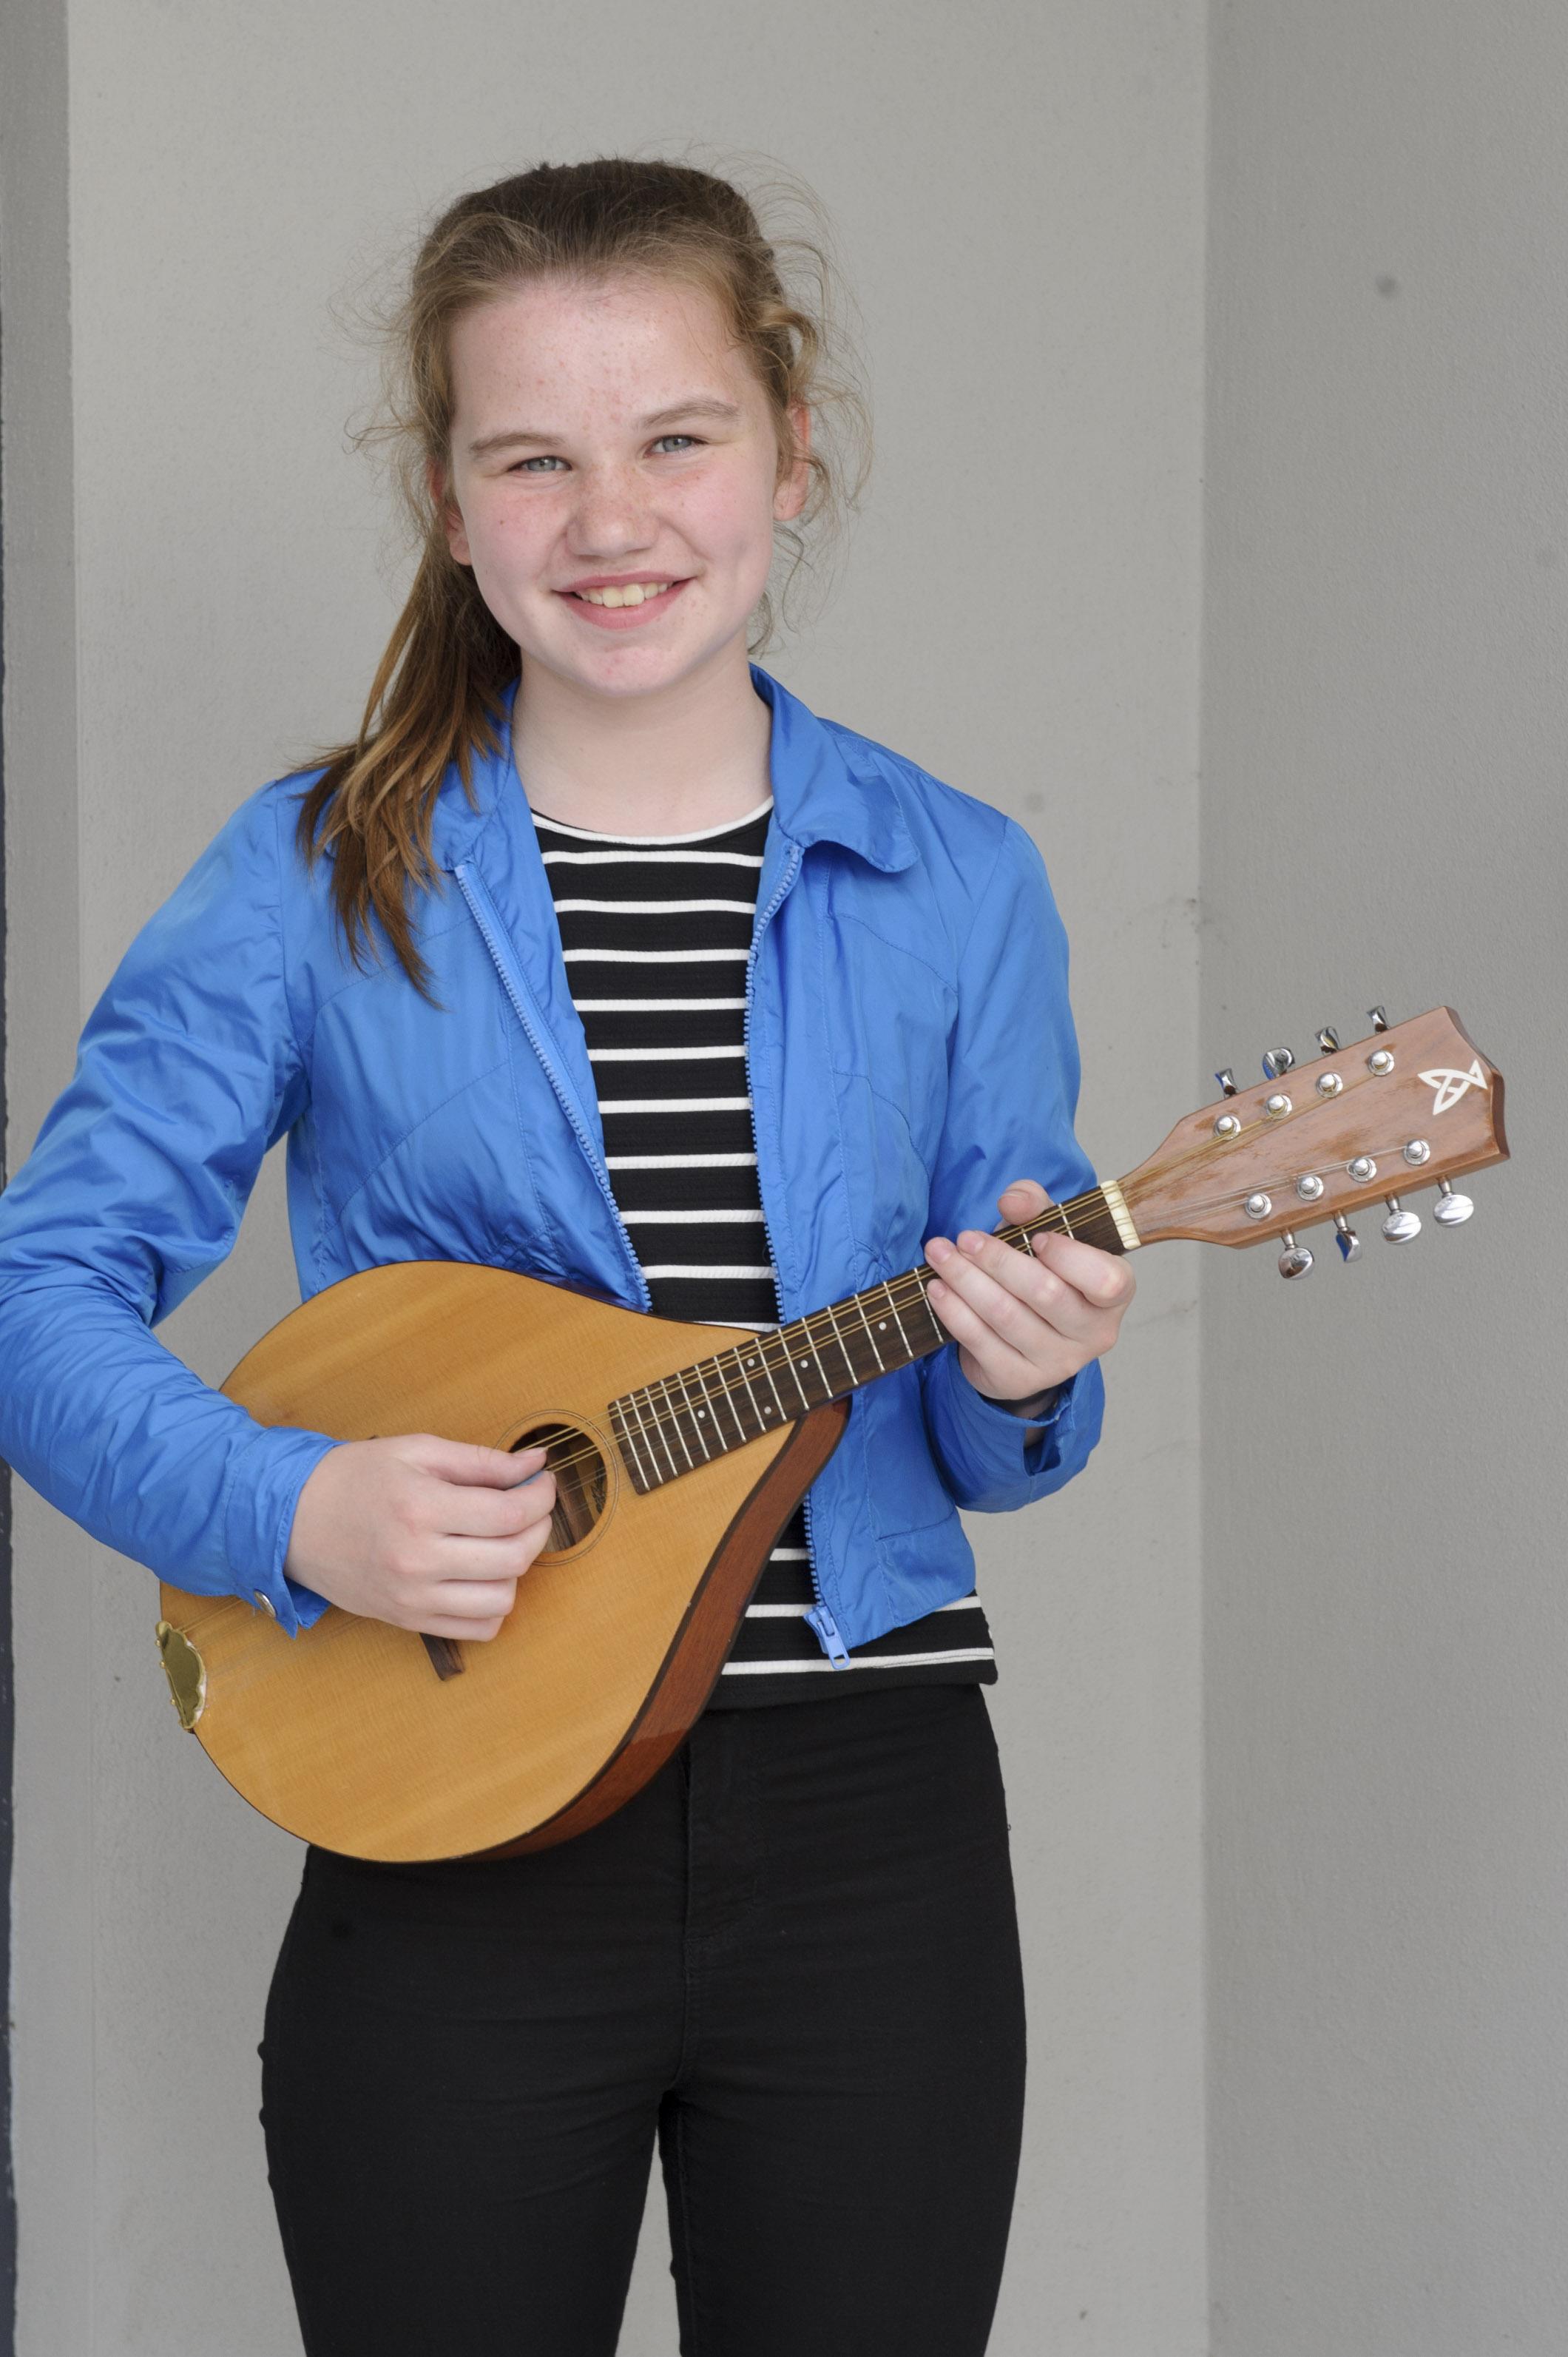 Dearbhla Ní Ghallchóir, Baile Mhuineacháin CCE, who was winner of the U-15 Mandolin competition. ©Rory Geary/The Northern Standard